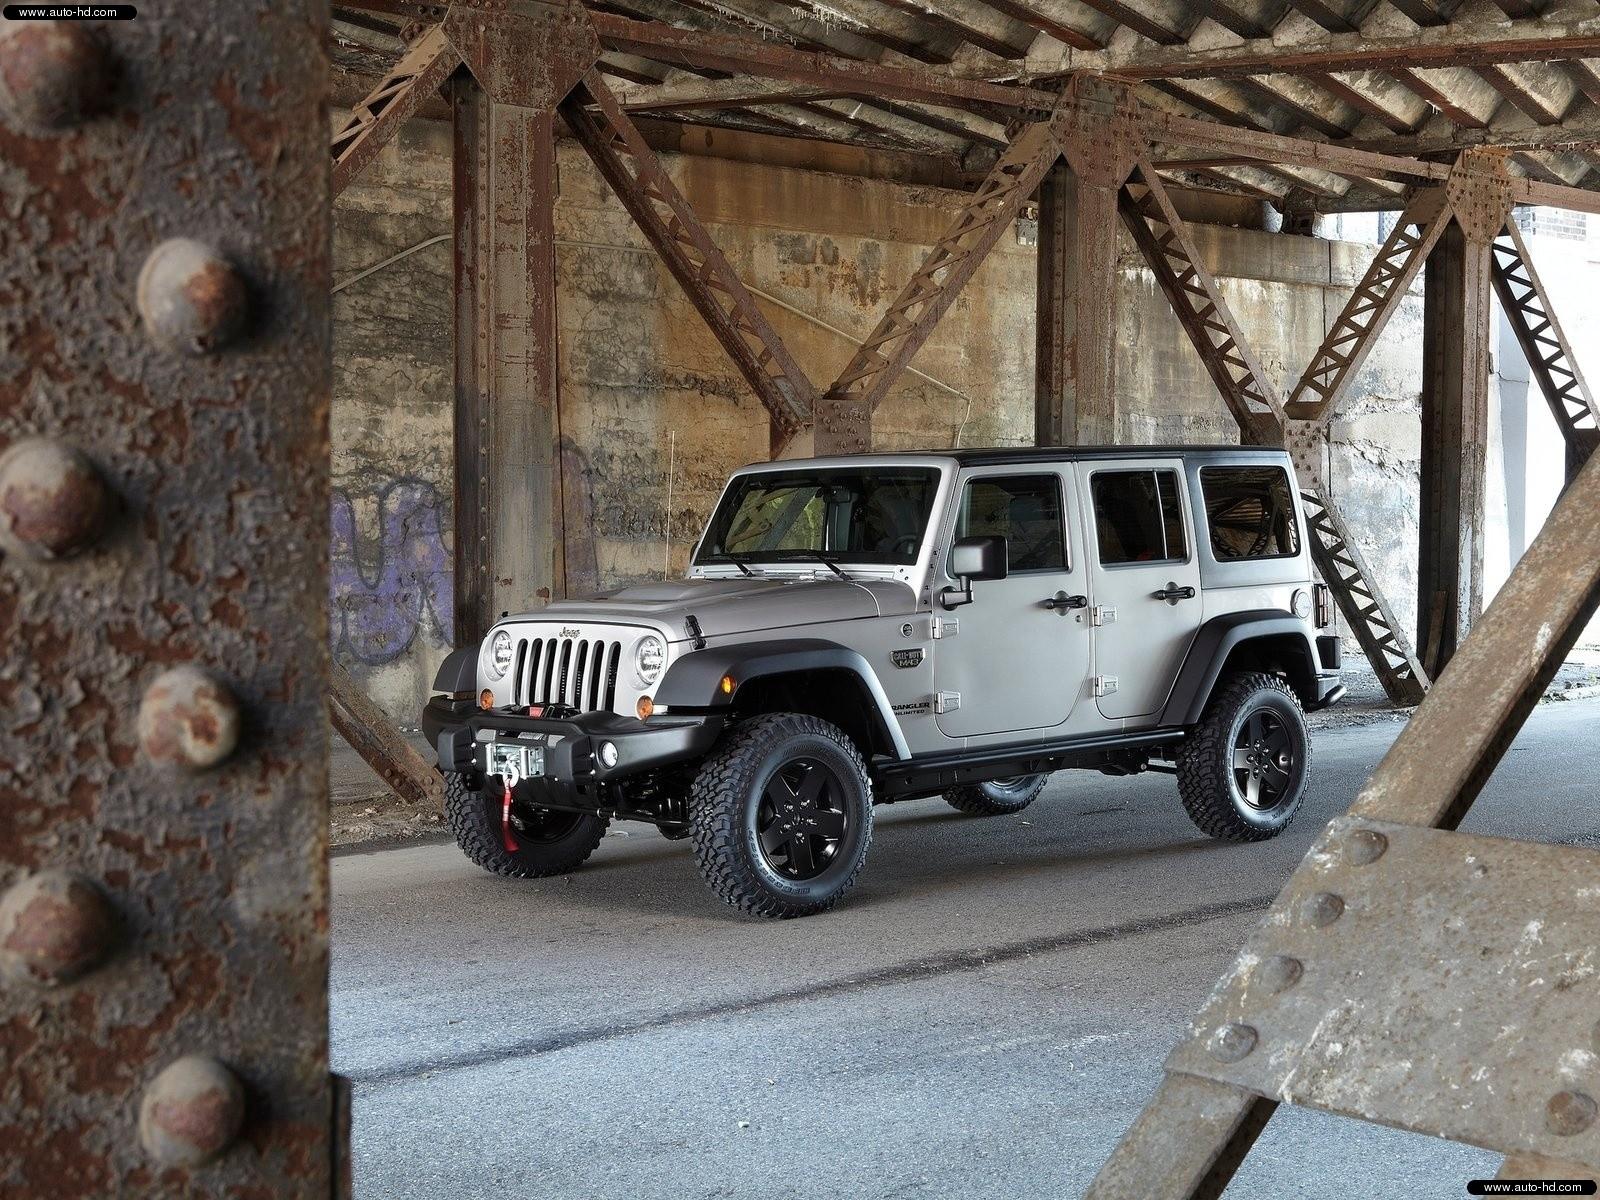 Jeep Jeep Wrangler Call Of Duty Mw3 2012